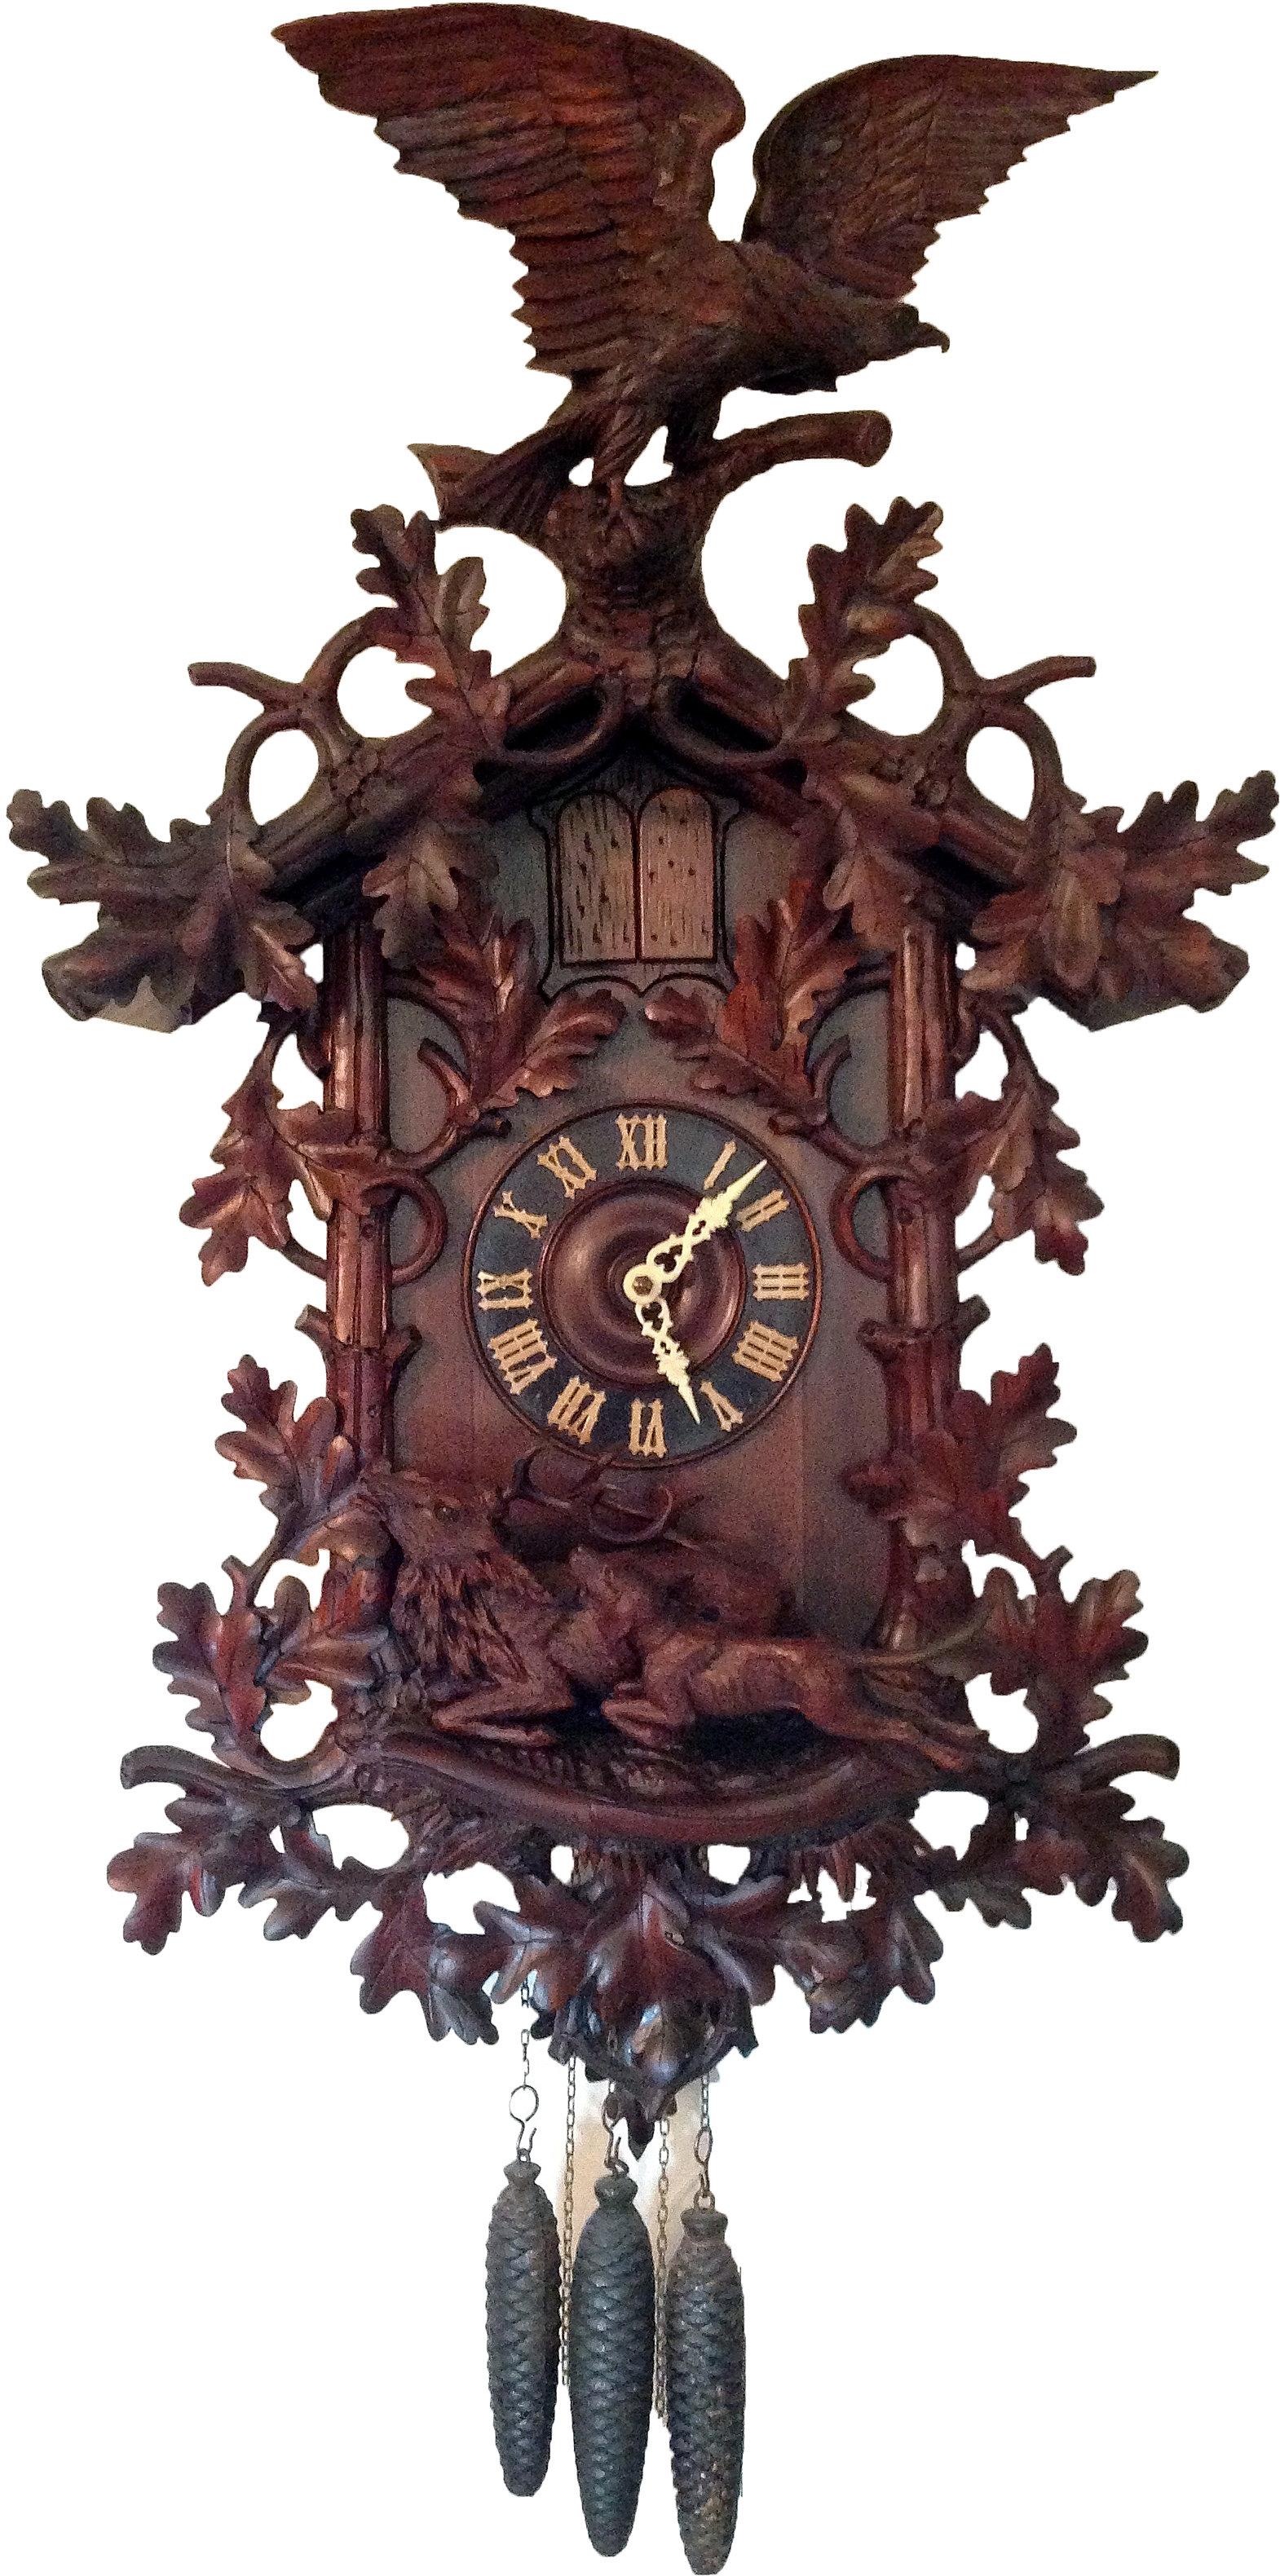 black forest cuckoo clock - Black Forest Cuckoo Clocks